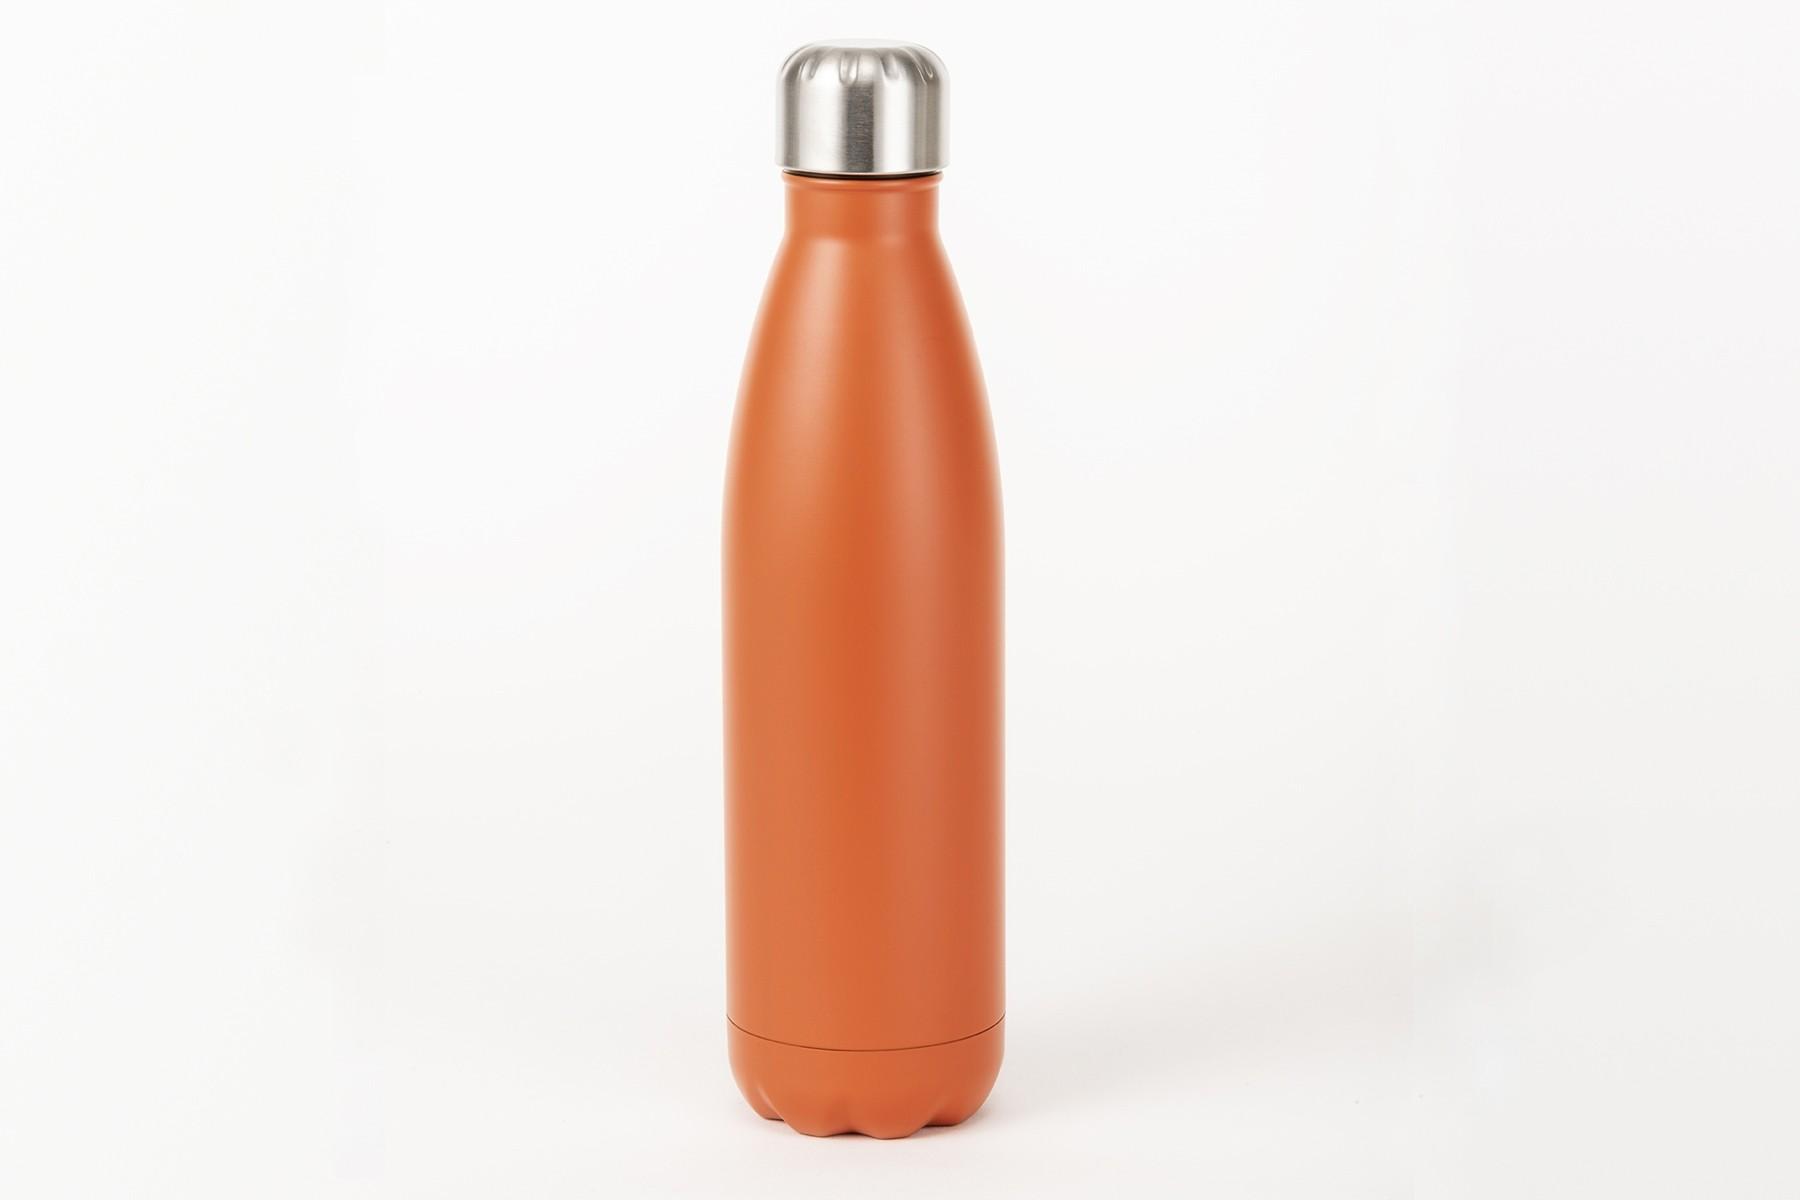 Butelka pomarańczowa, 500 ml